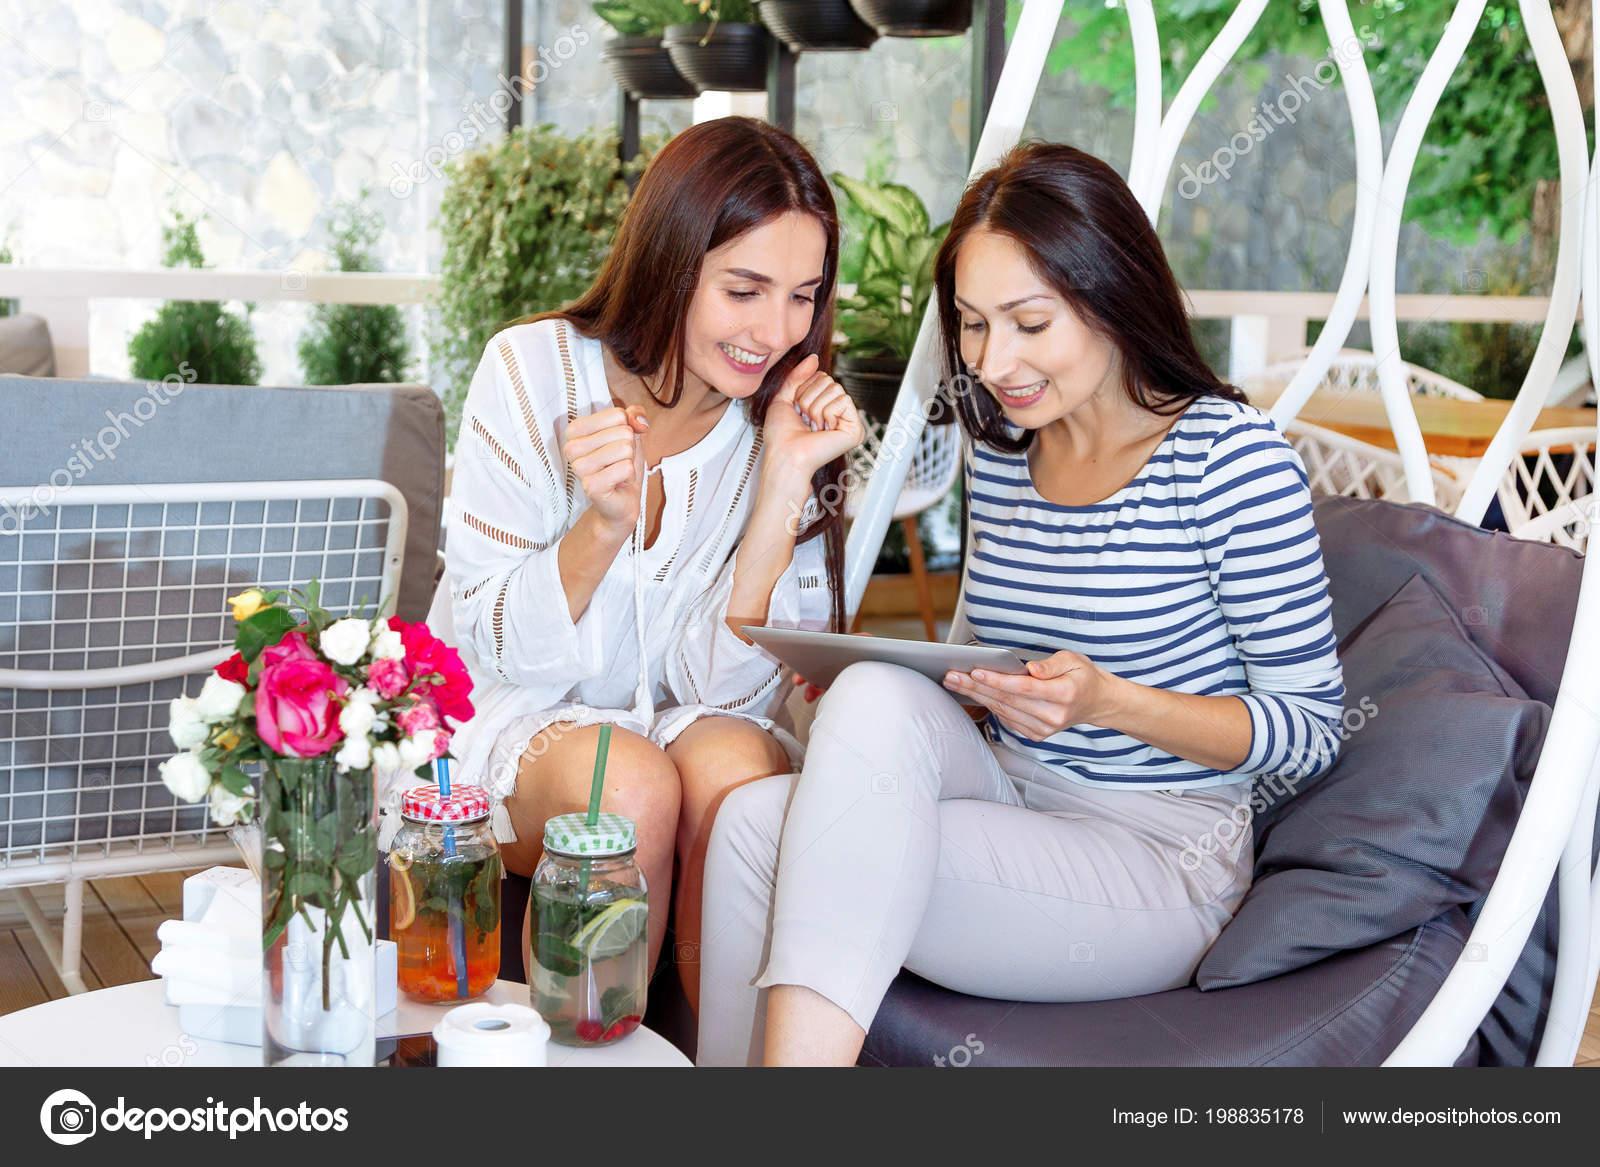 a896b9adb700 Chicas Felizes Glorían Compras Online Con Descuento Café Dos Mujeres ...